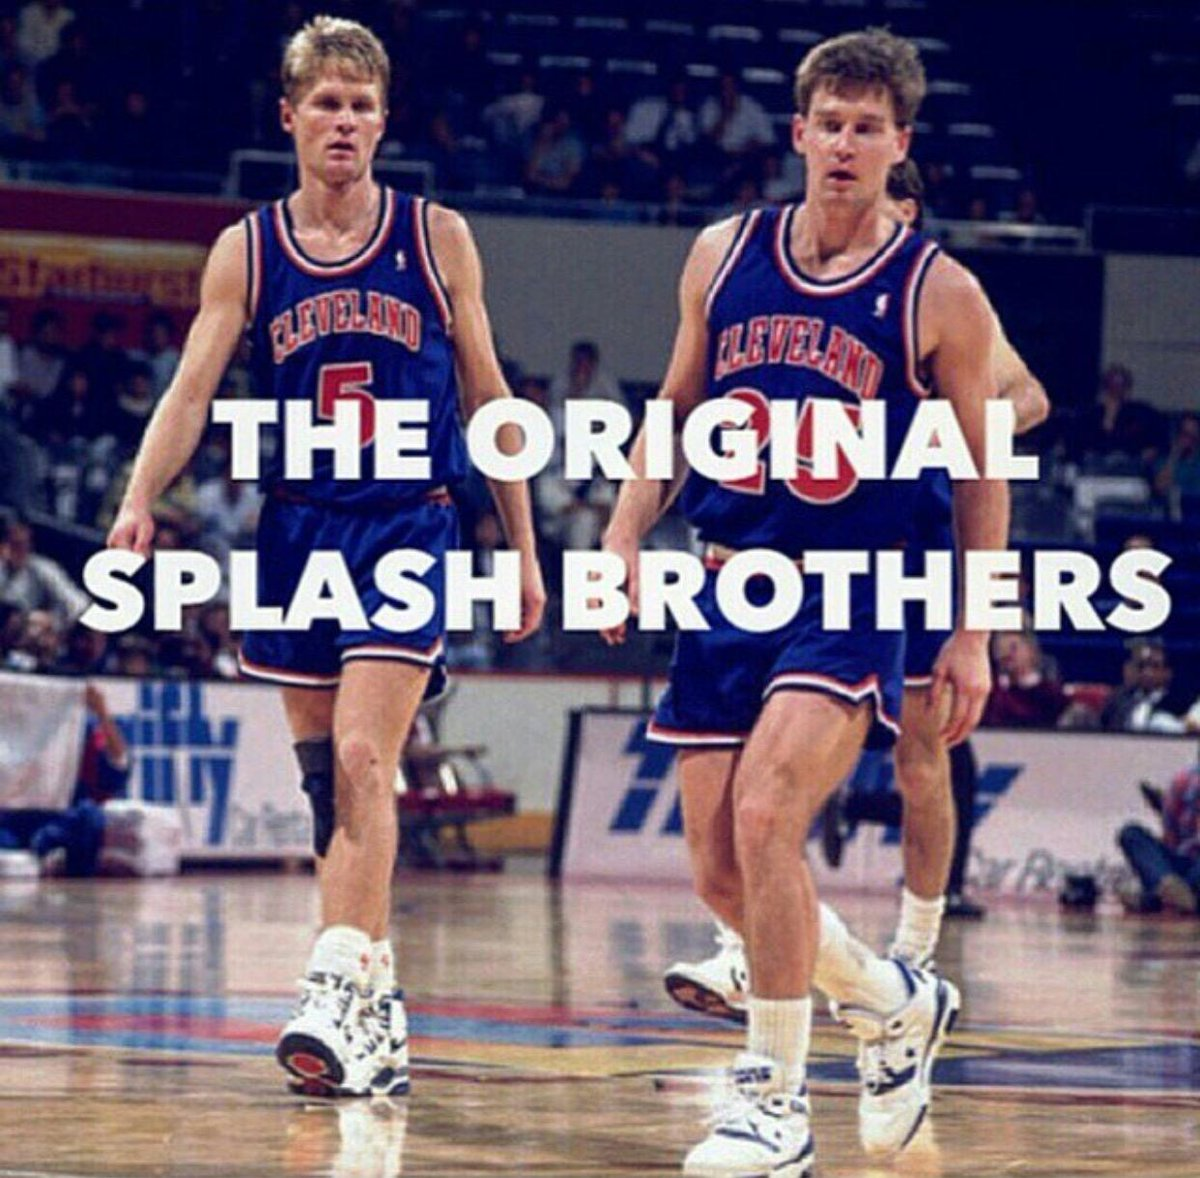 The originators!! @Mark25Price http://t.co/DtOjldZd0q